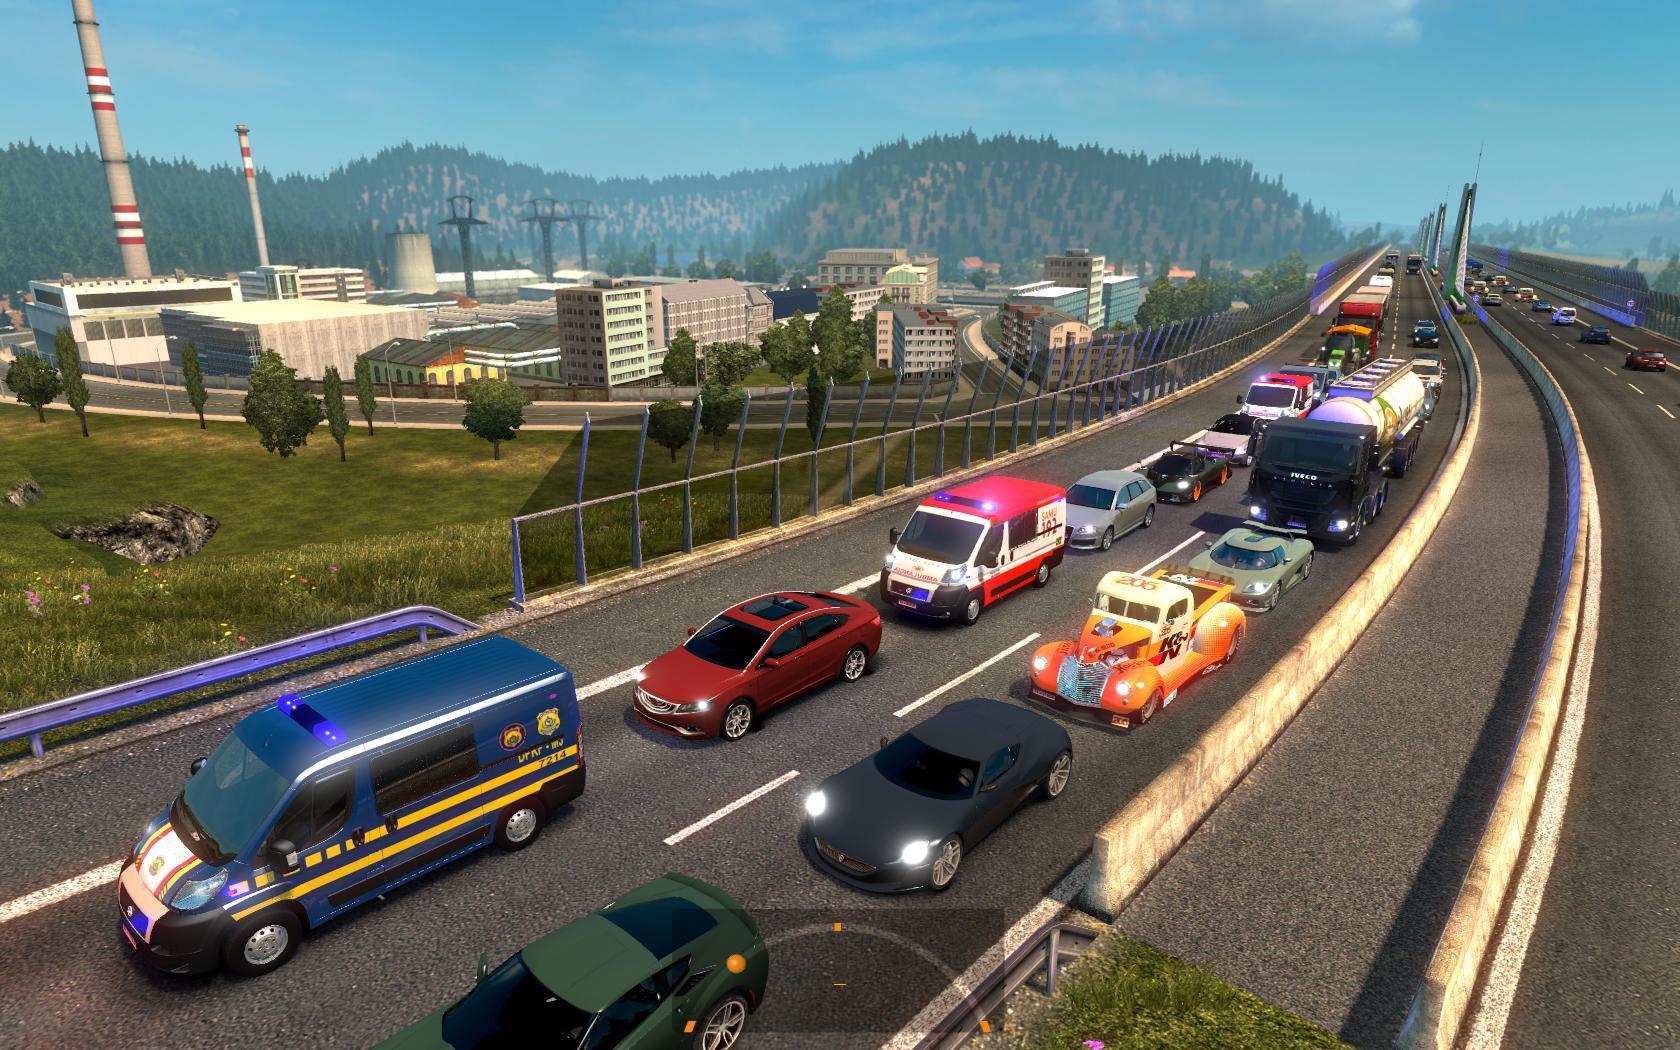 Real Traffic Density v3 0 by Cip (update 15-Oct-17) | ETS2